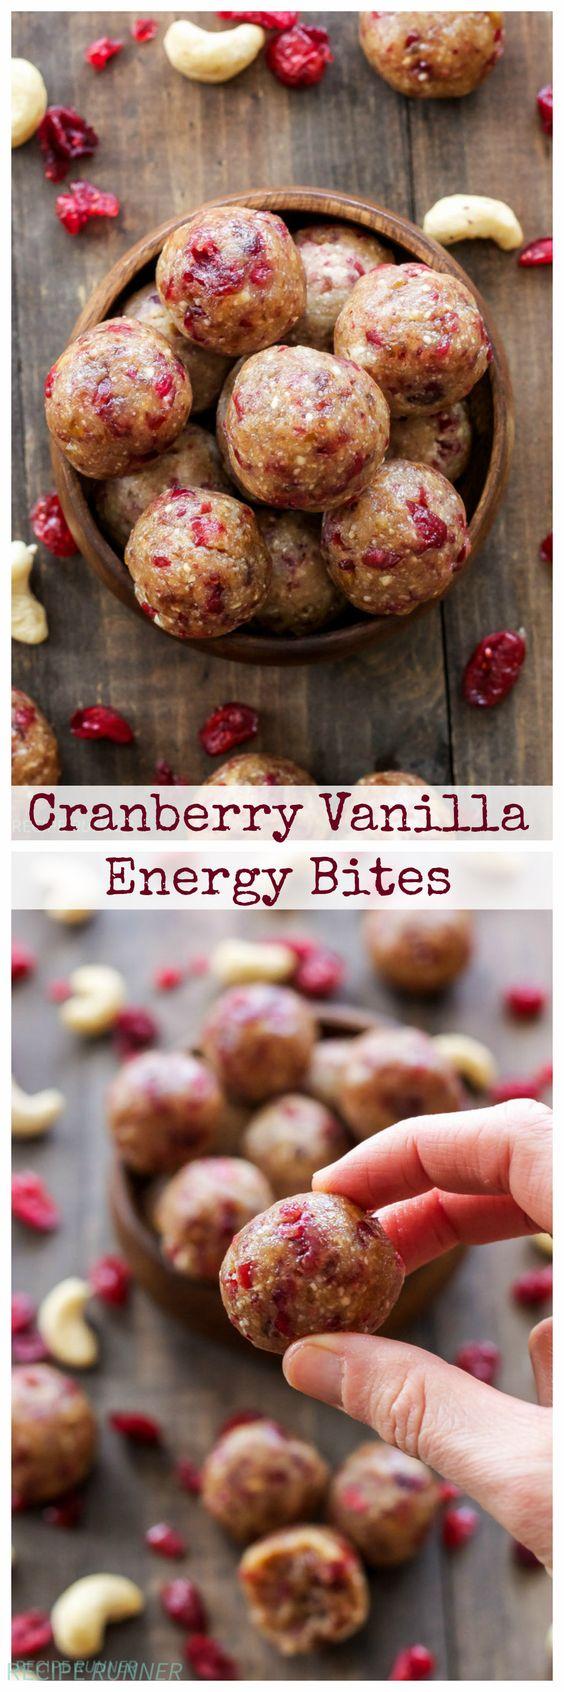 cranberry vanilla energy bites - vegan, gluten free